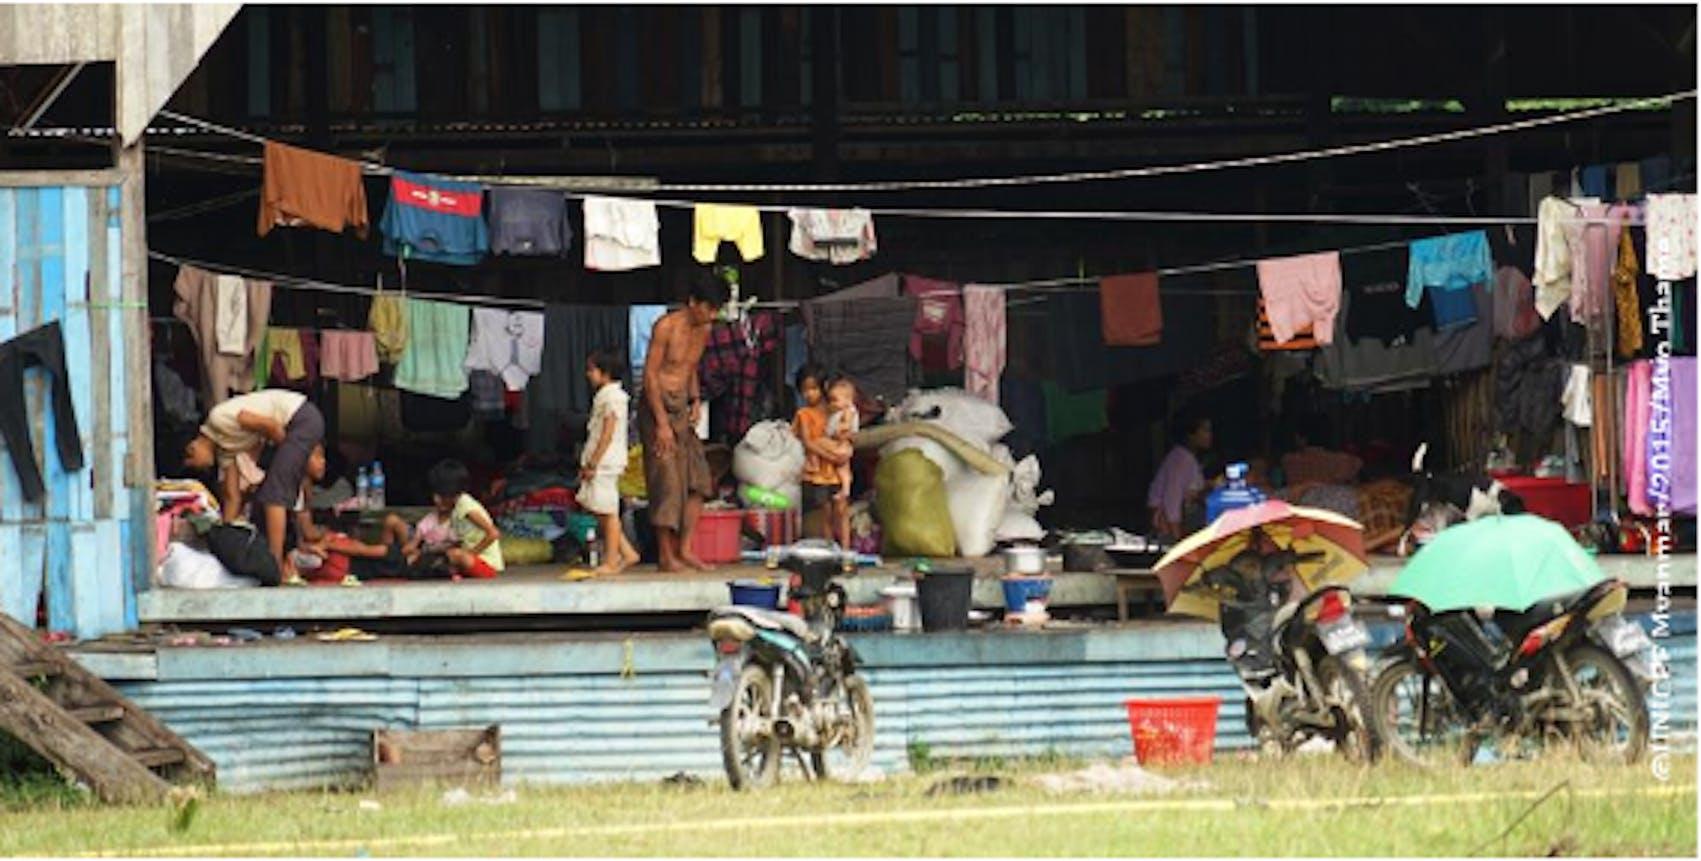 ©UNICEF Myanmar/2015/Myn Thame